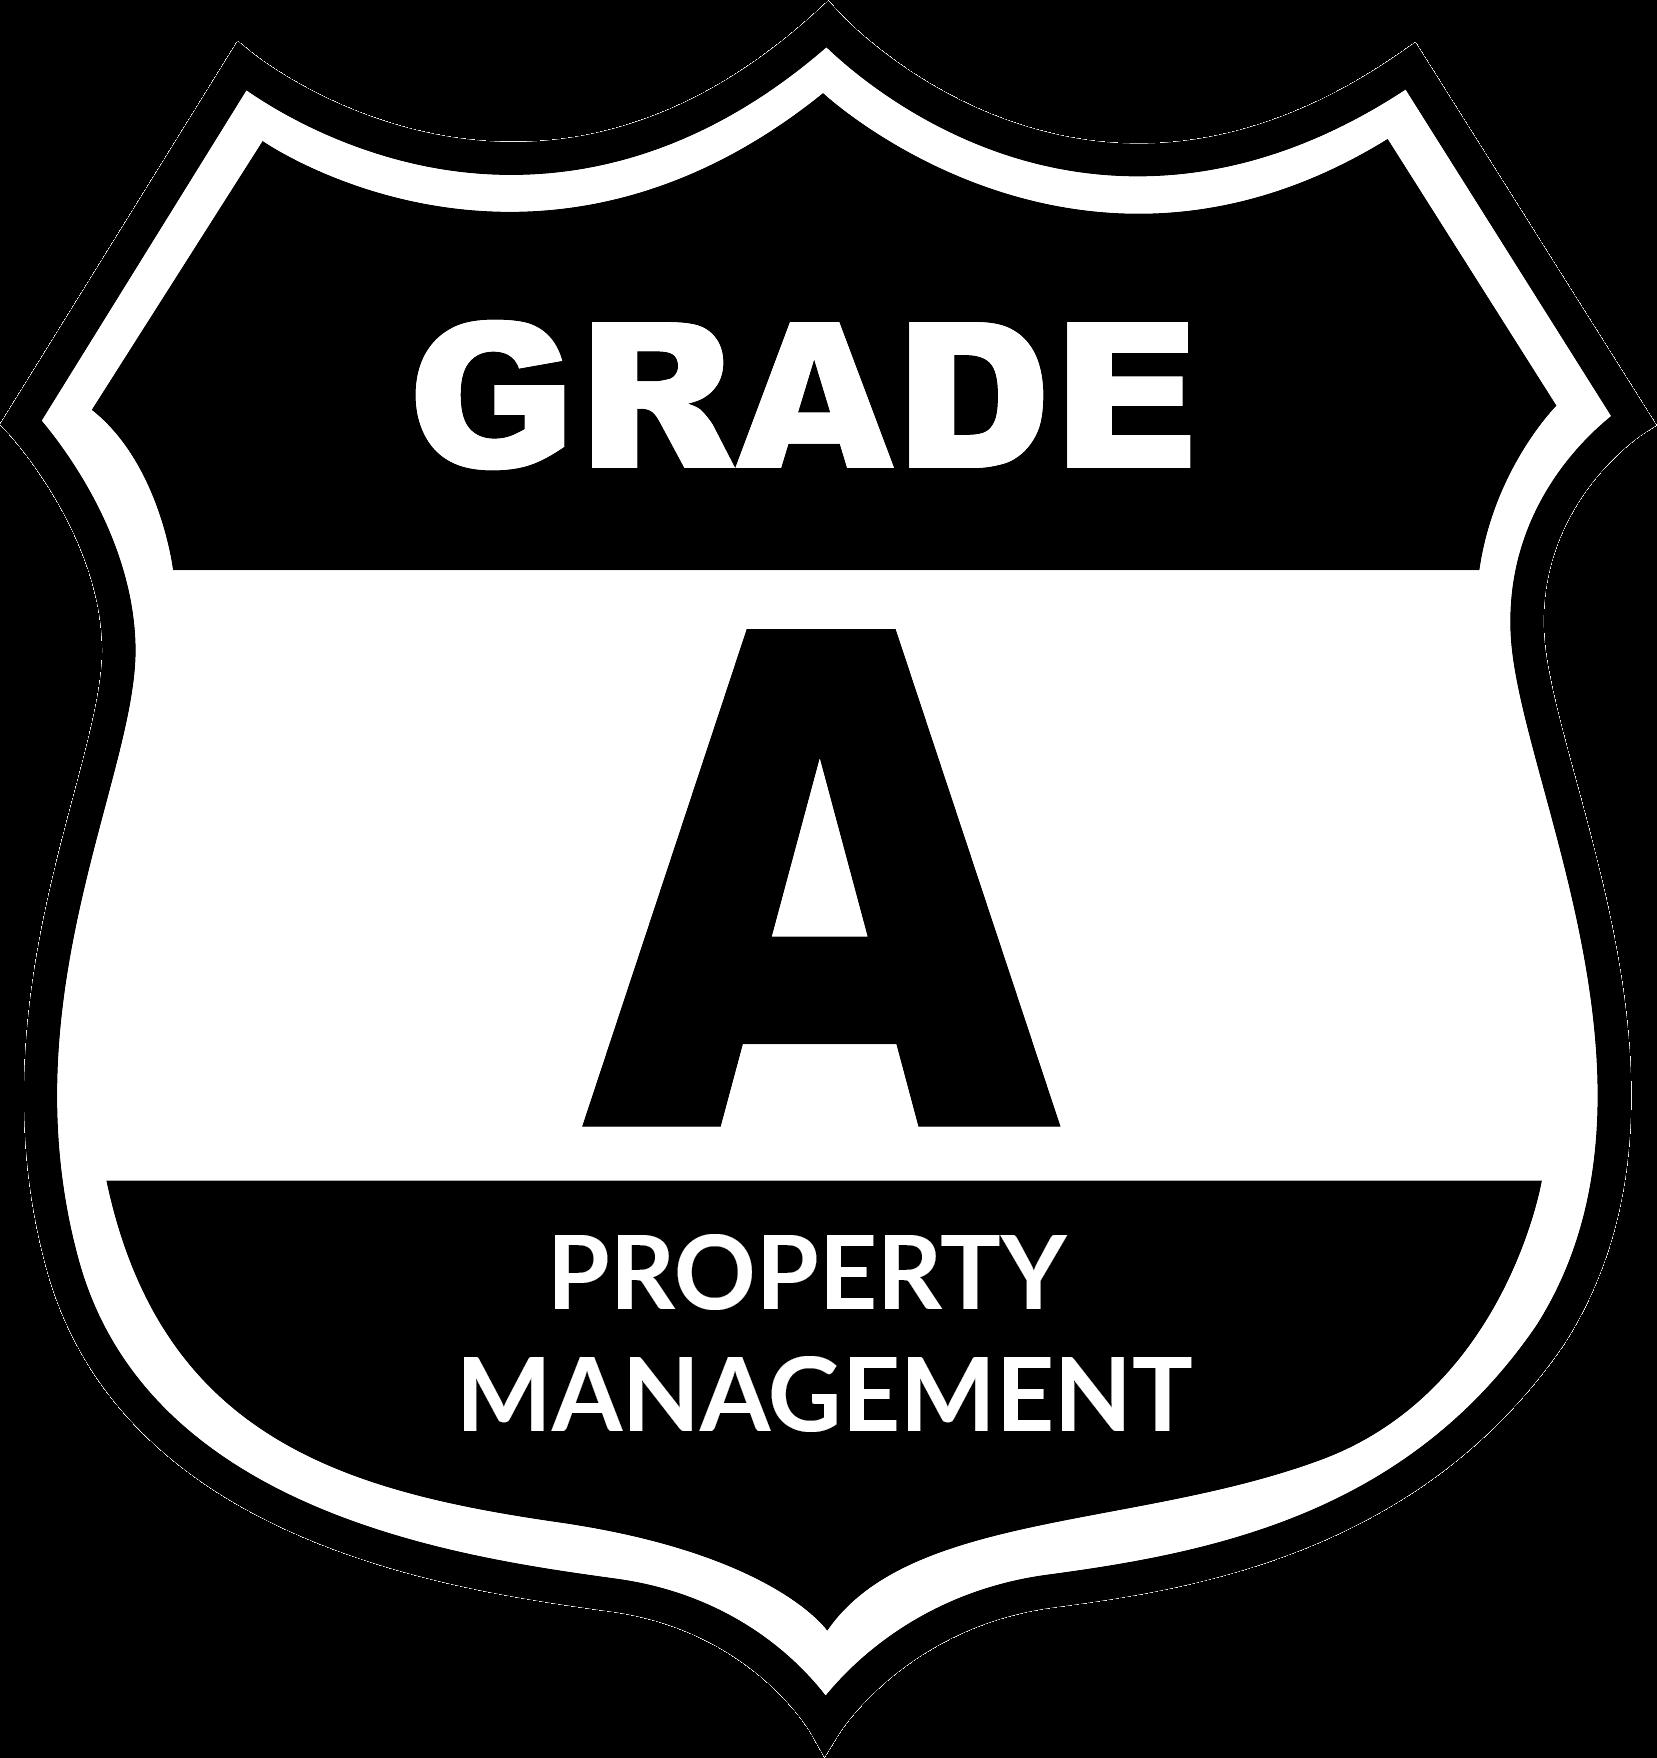 Grade A No Wording at bottom-02C